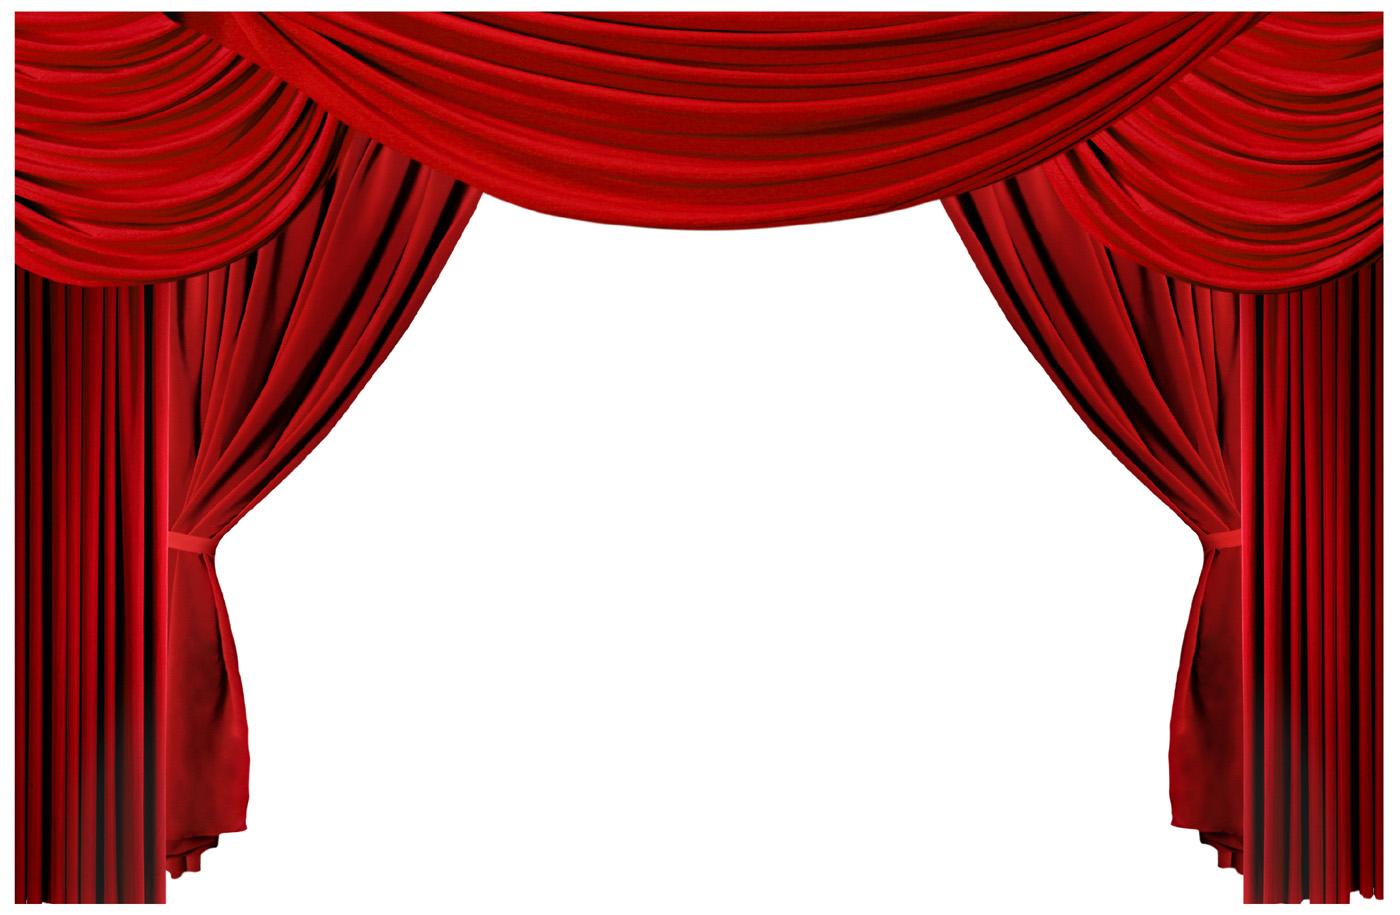 Theater Curtains Png | Homeminimalis.com